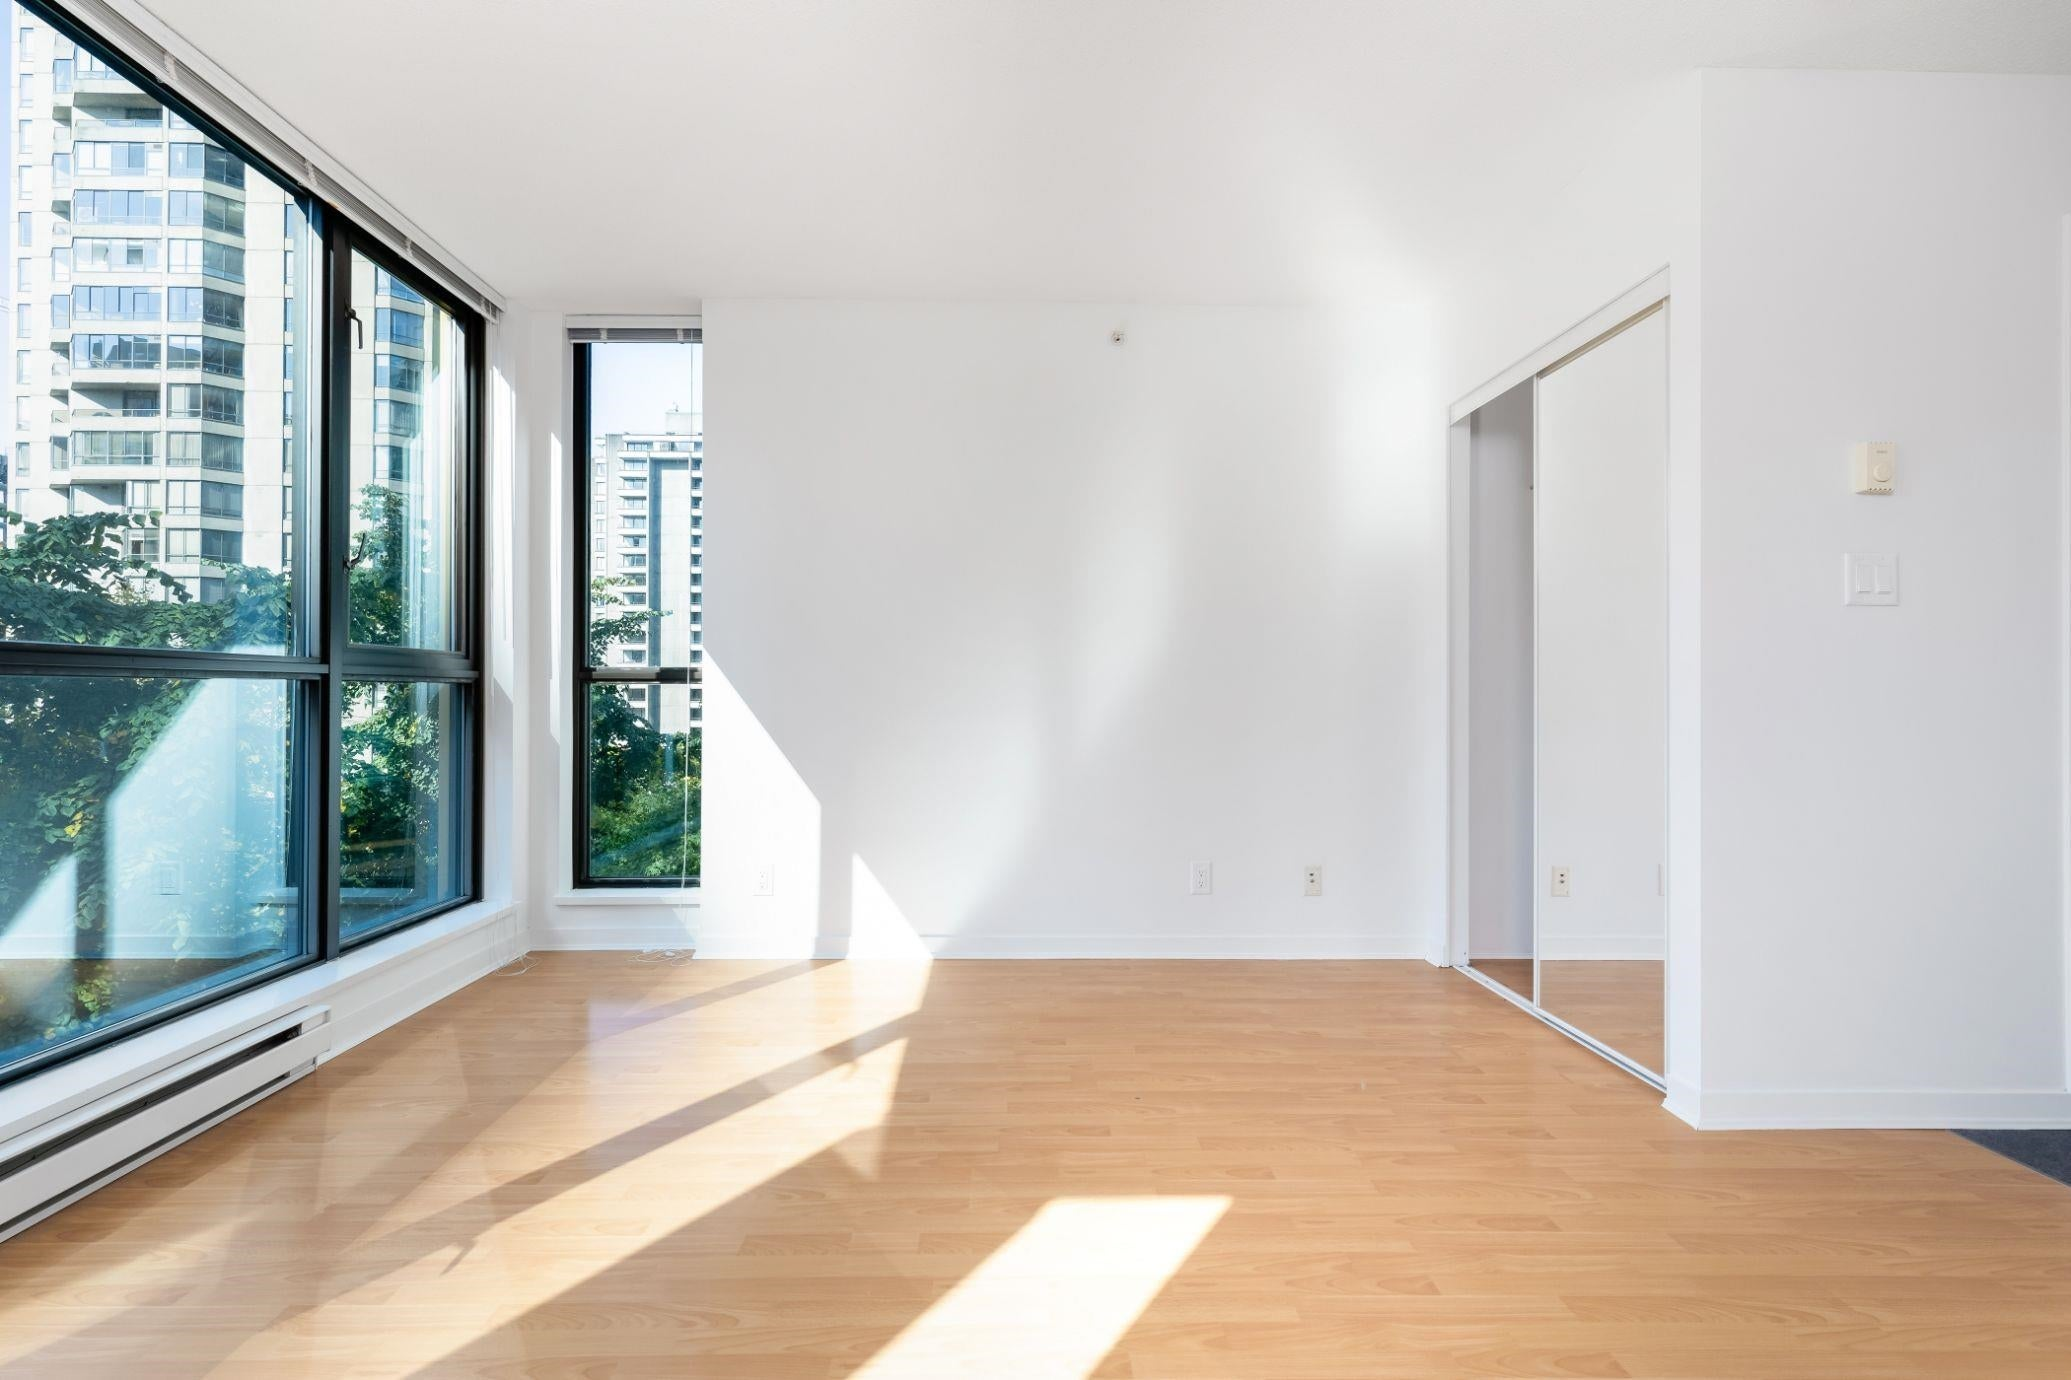 509 1331 ALBERNI STREET - West End VW Apartment/Condo for sale(R2625060) - #1